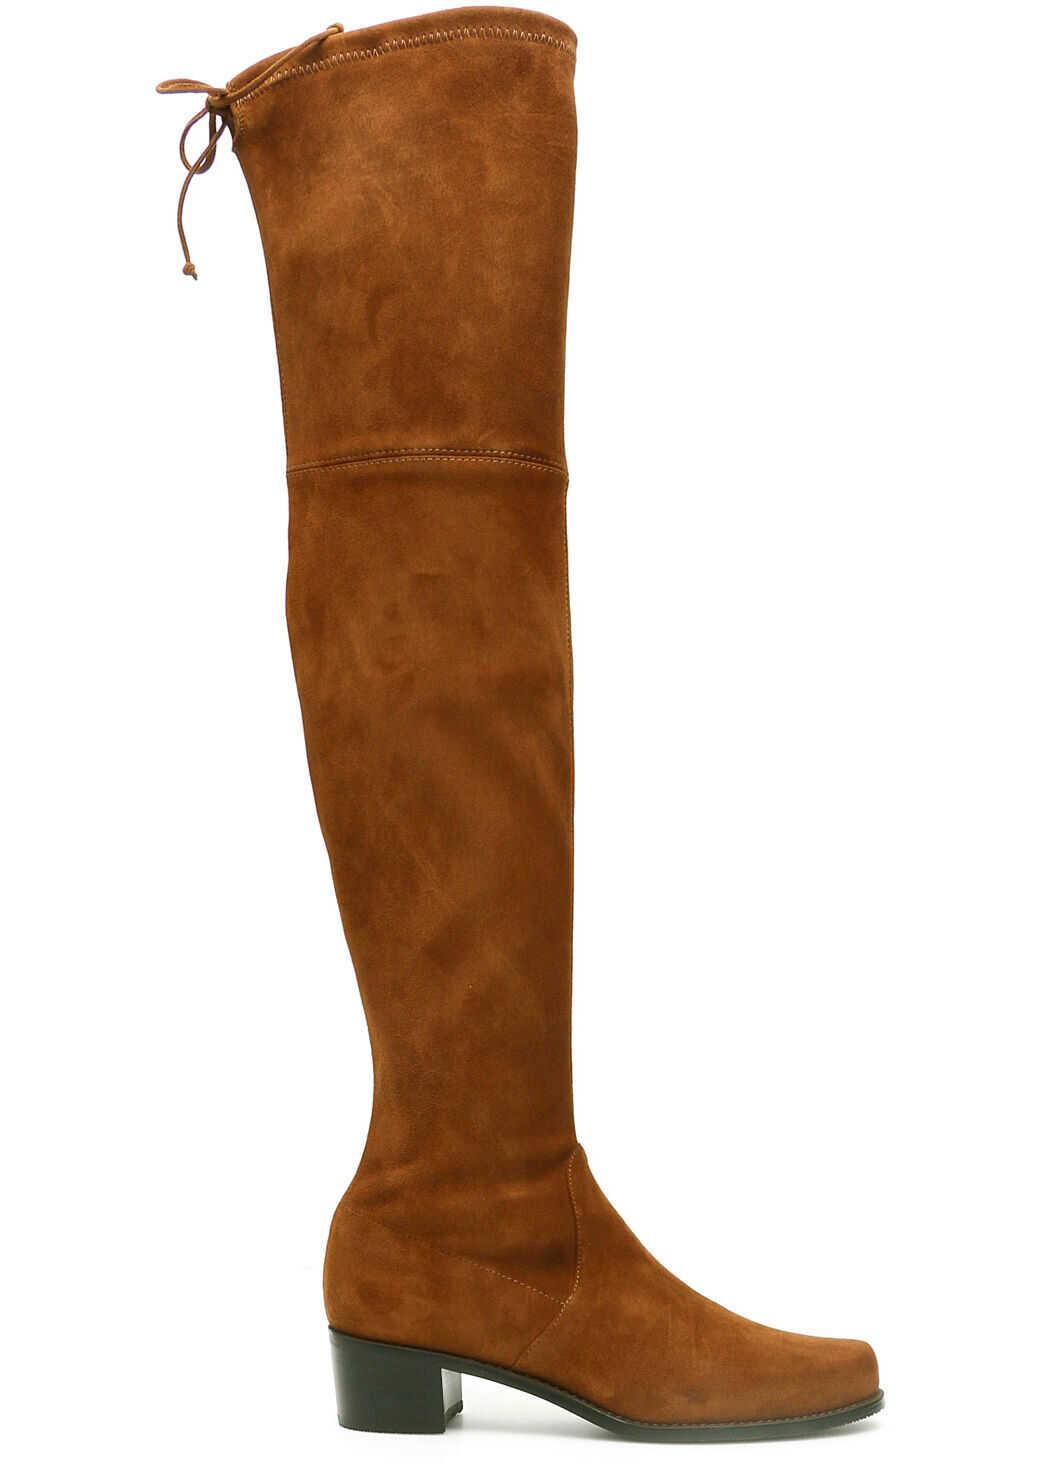 Stuart Weitzman Suede Midland Boots MIDLAND COFFEE imagine b-mall.ro